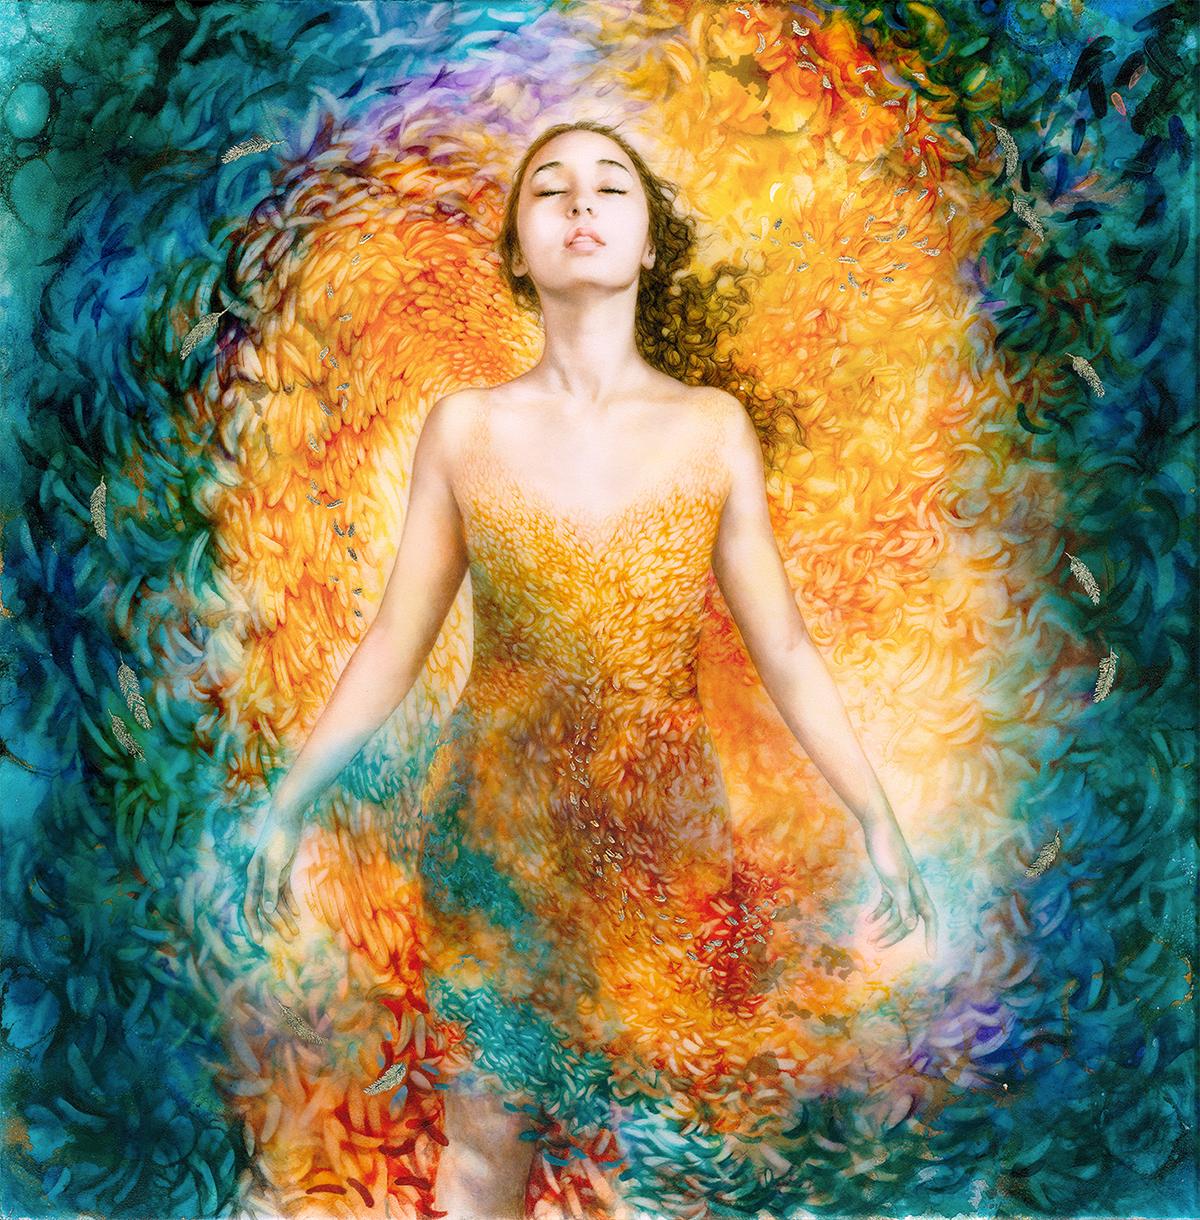 Birth of An Angel by Kerry Darlington